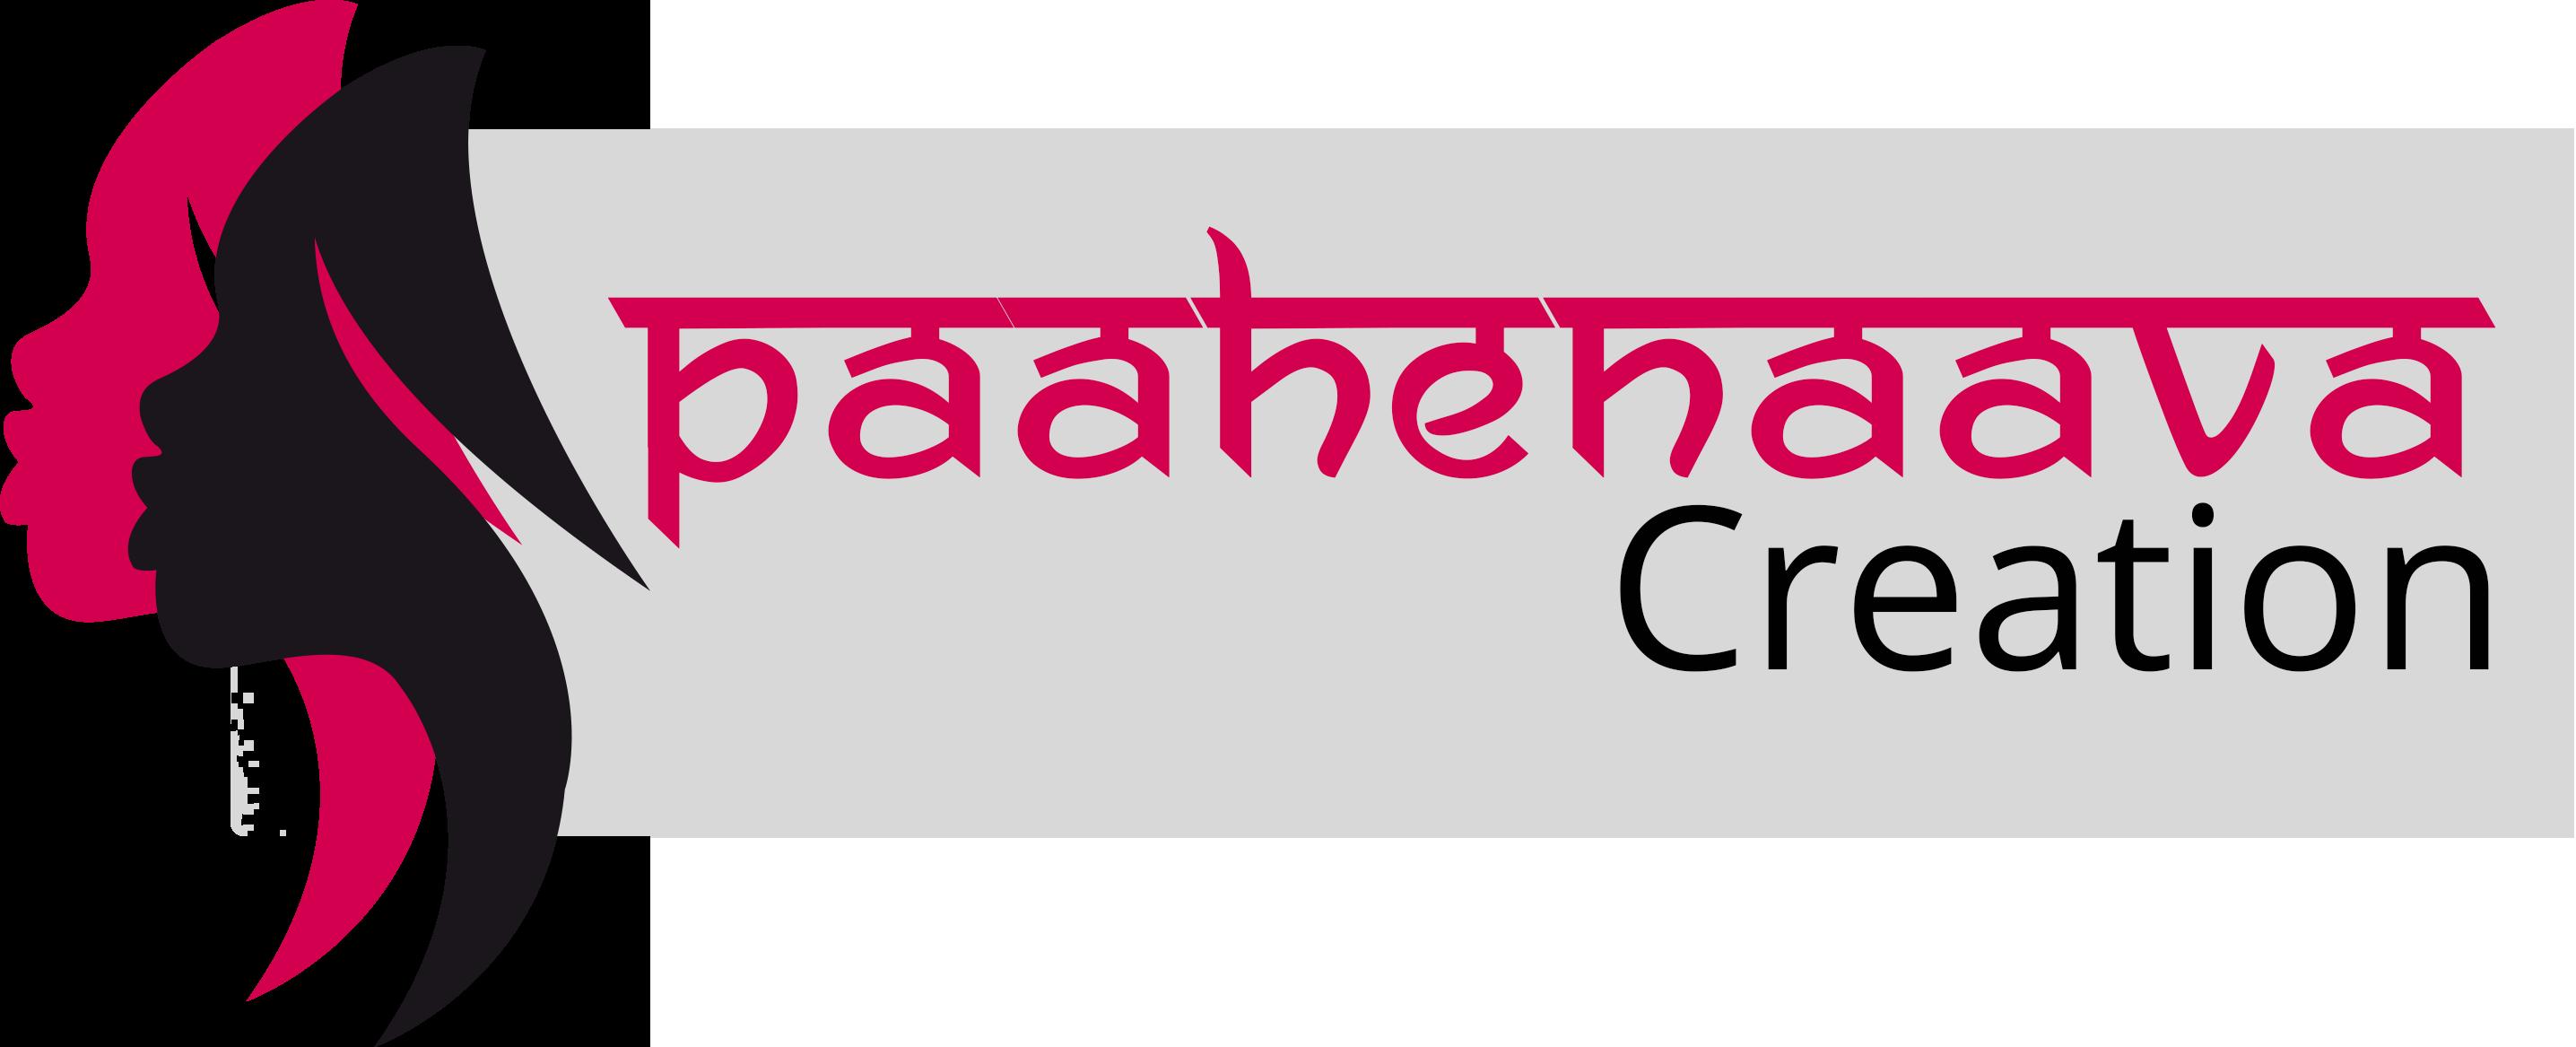 Paahenaava Creation